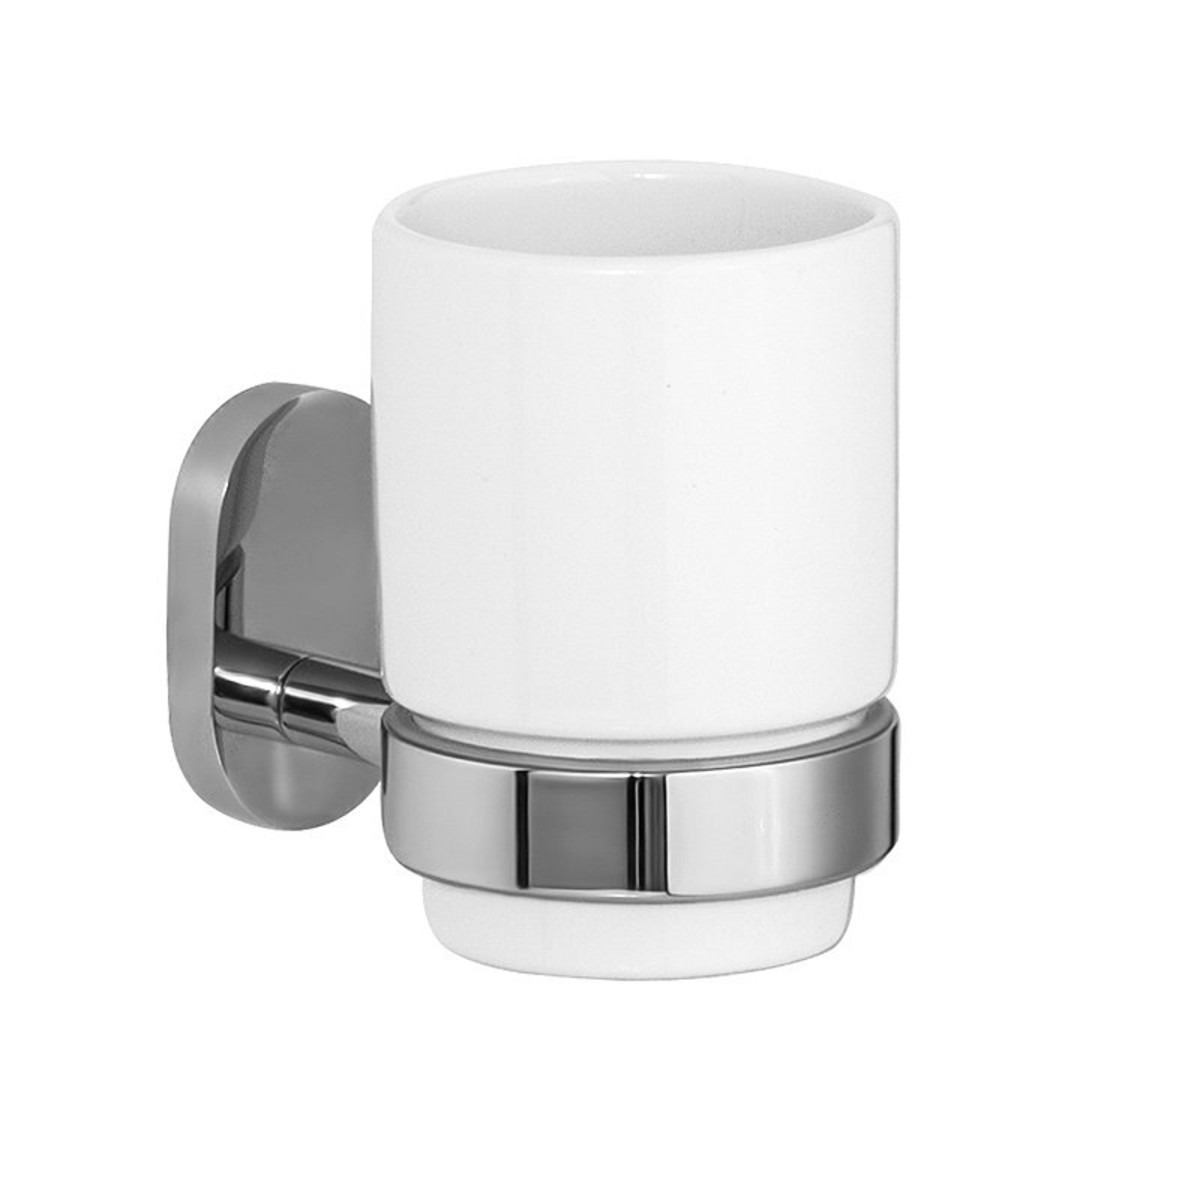 Стакан для ванной IDDIS Mirro Plus MRPSBC1i45